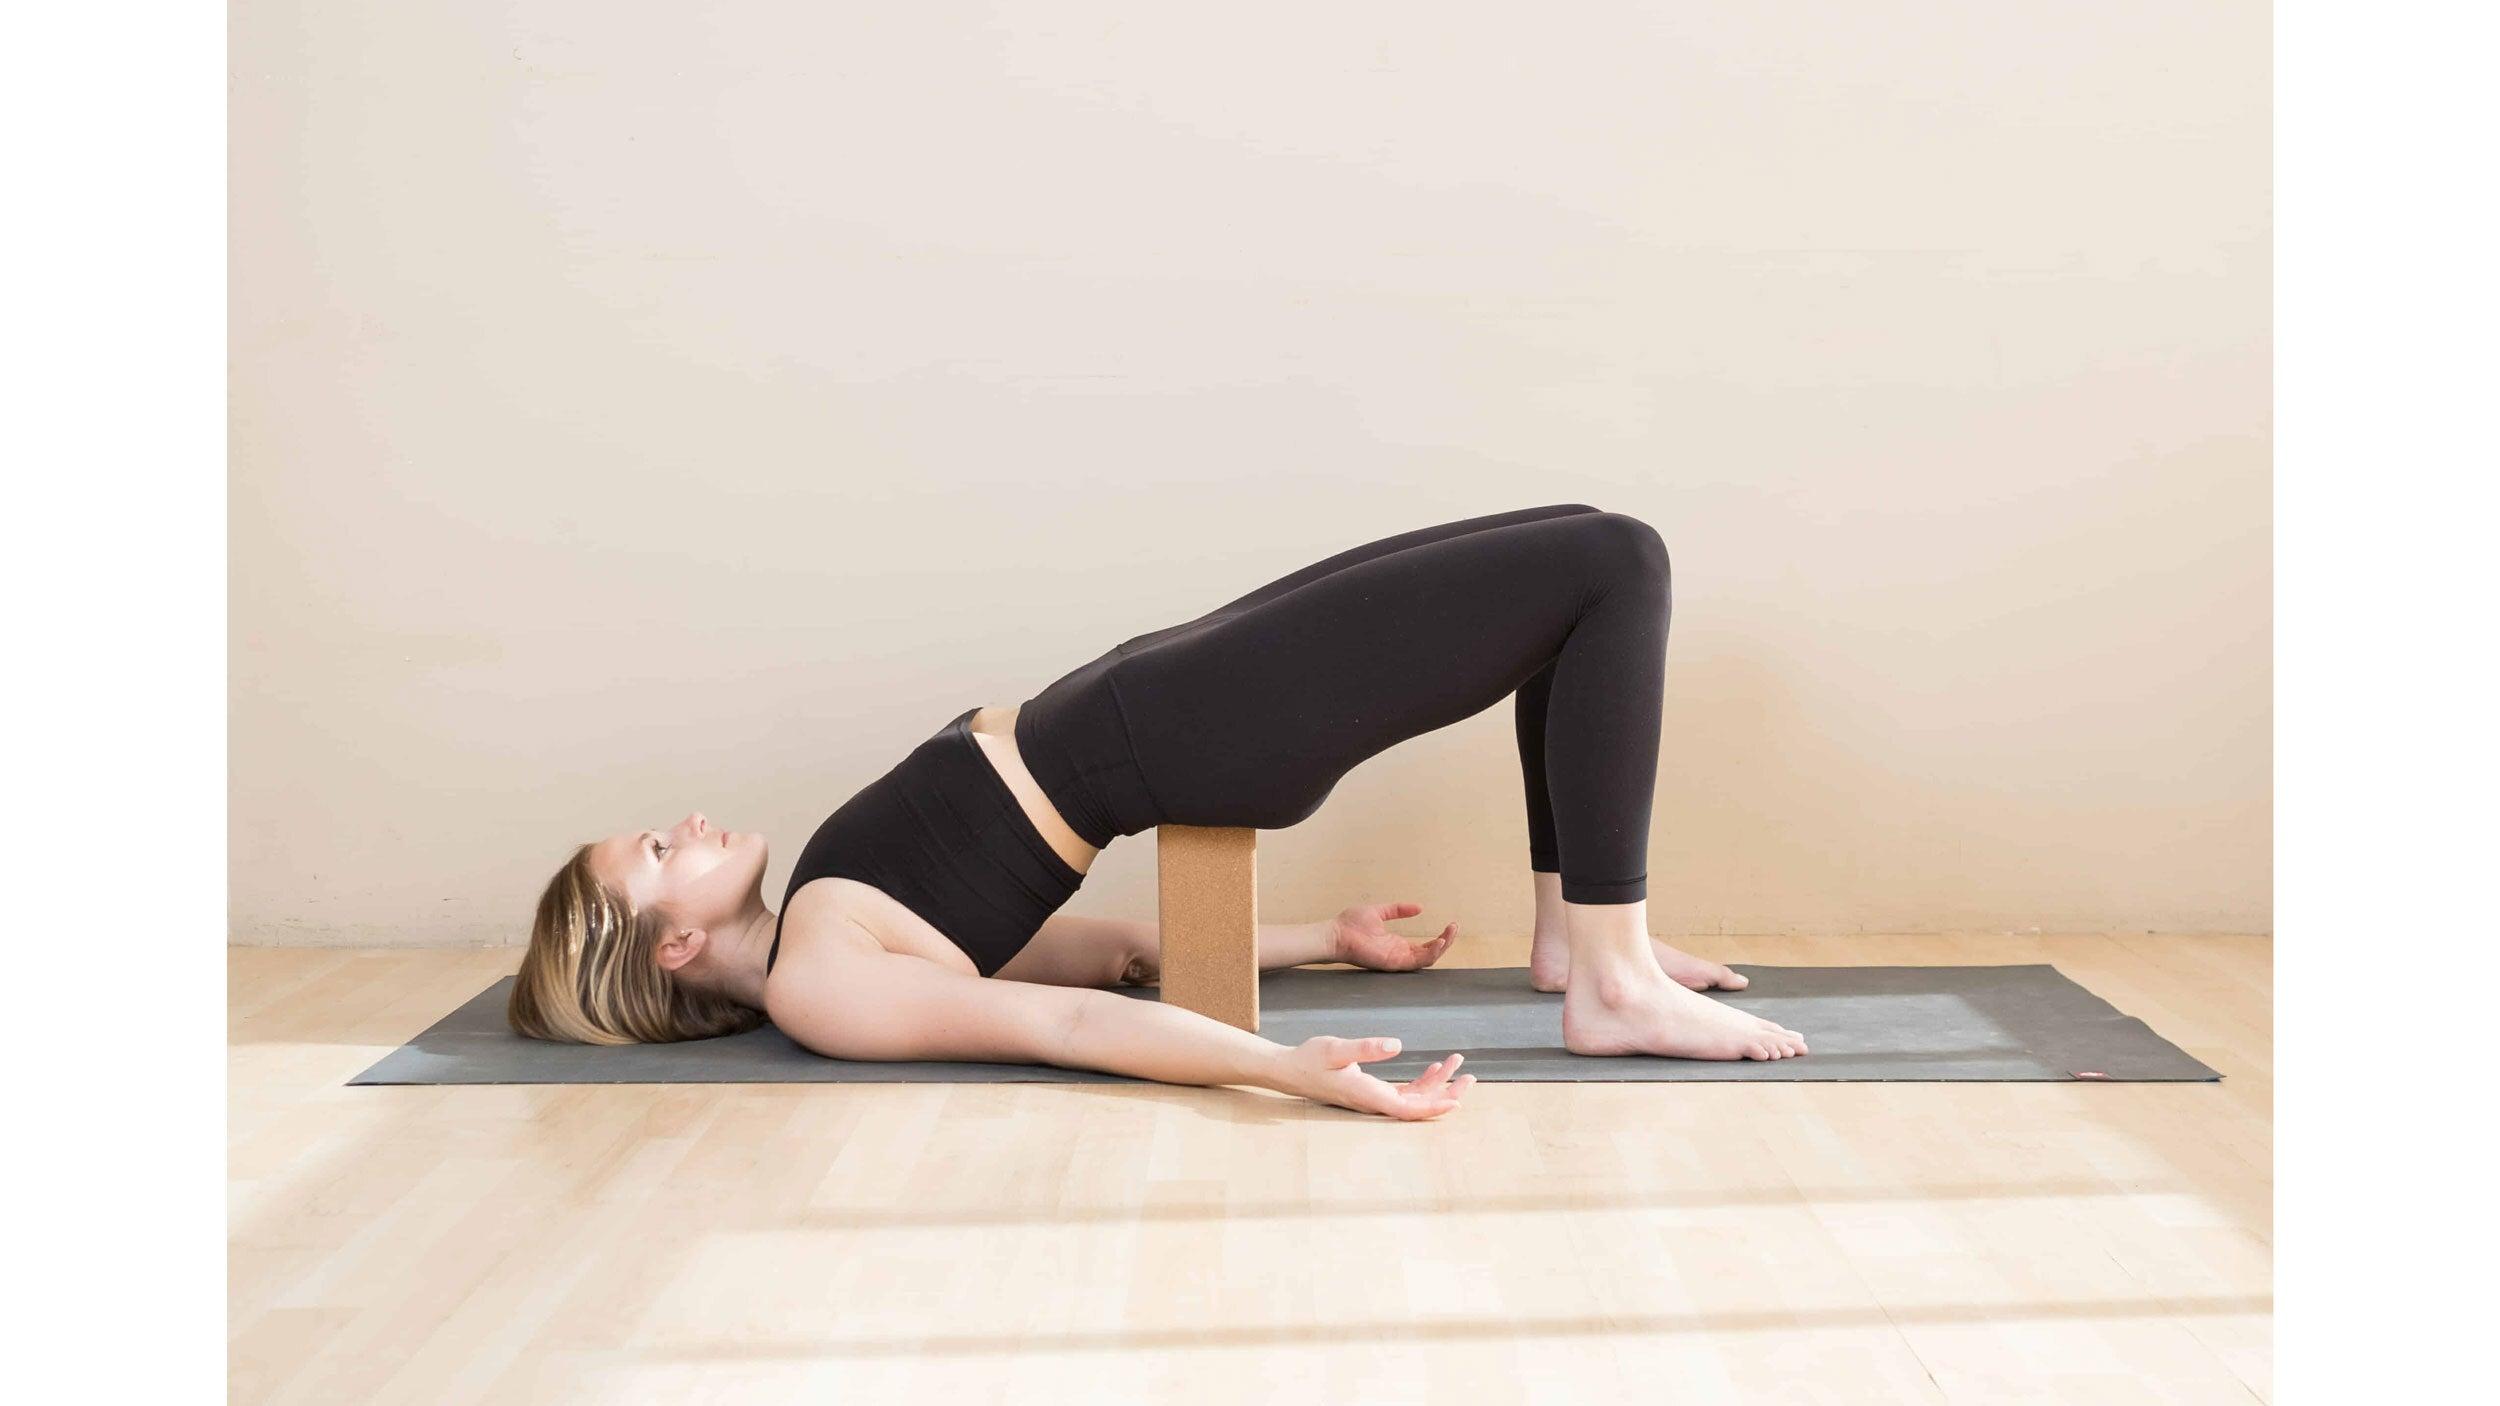 A woman performs Setu Bandha Sarvangasana, variations (Bridge Pose) in yoga